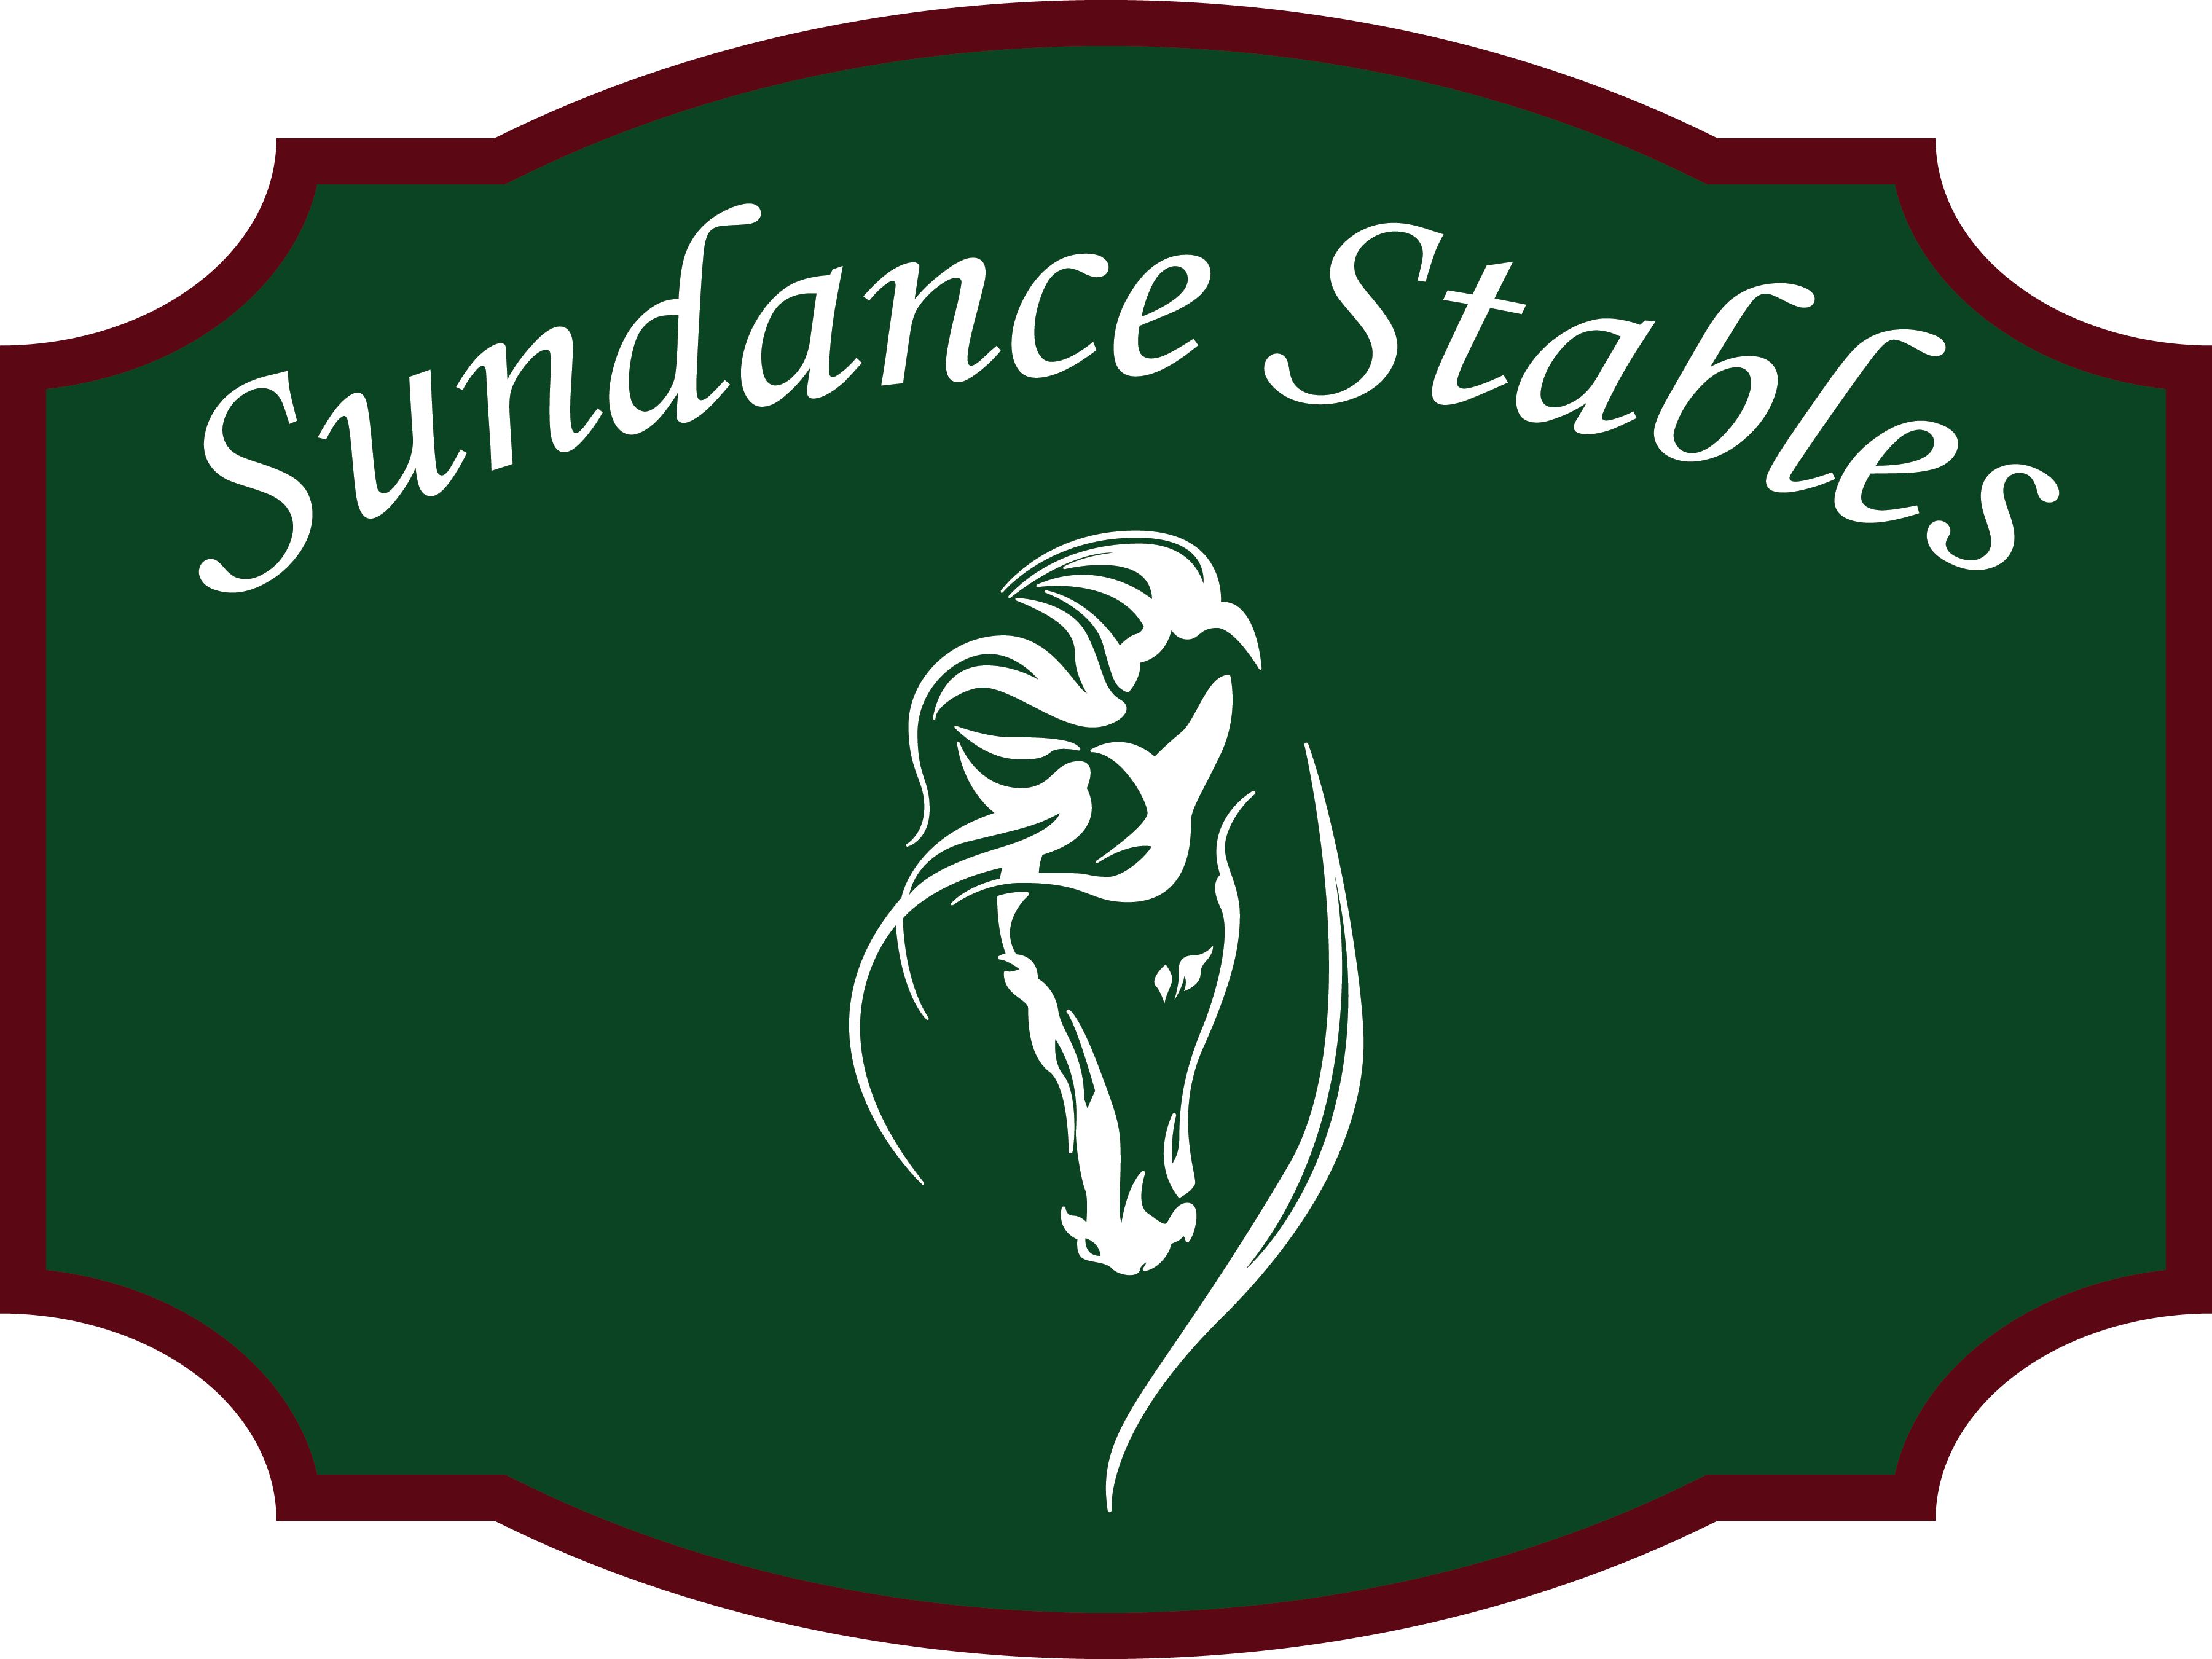 Sundance Stables